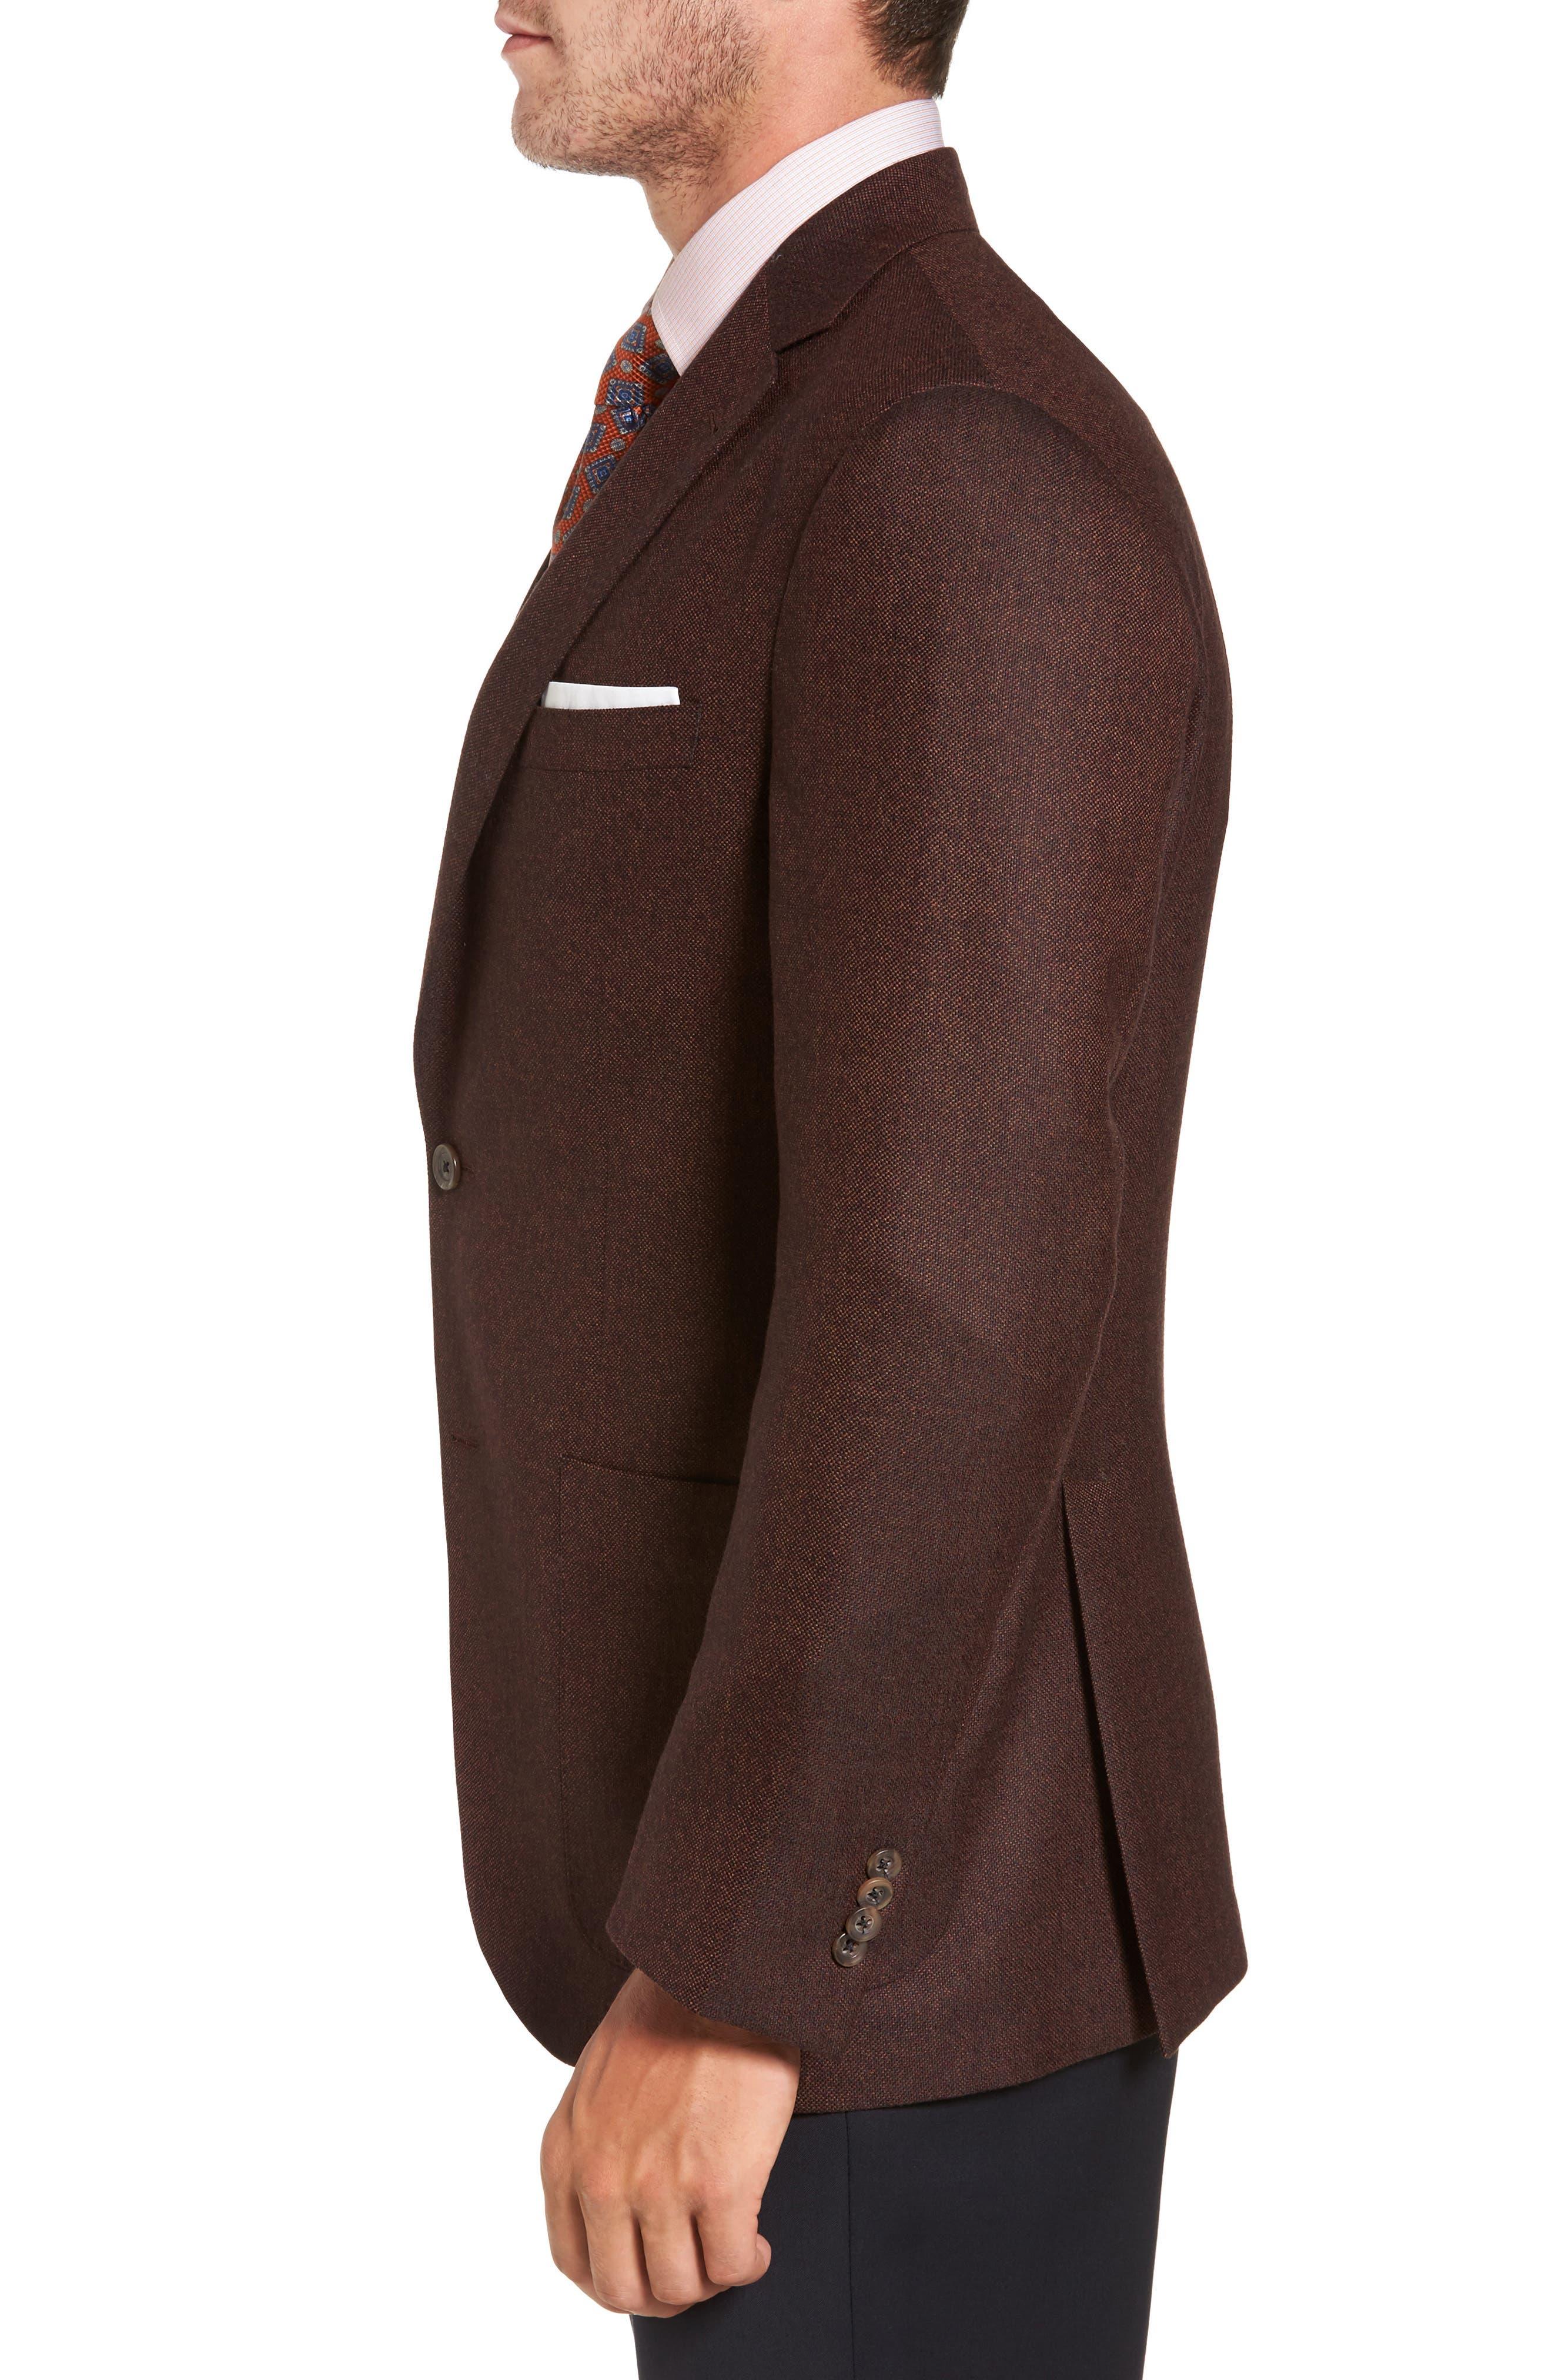 Aiden Classic Fit Wool Sport Coat,                             Alternate thumbnail 3, color,                             252